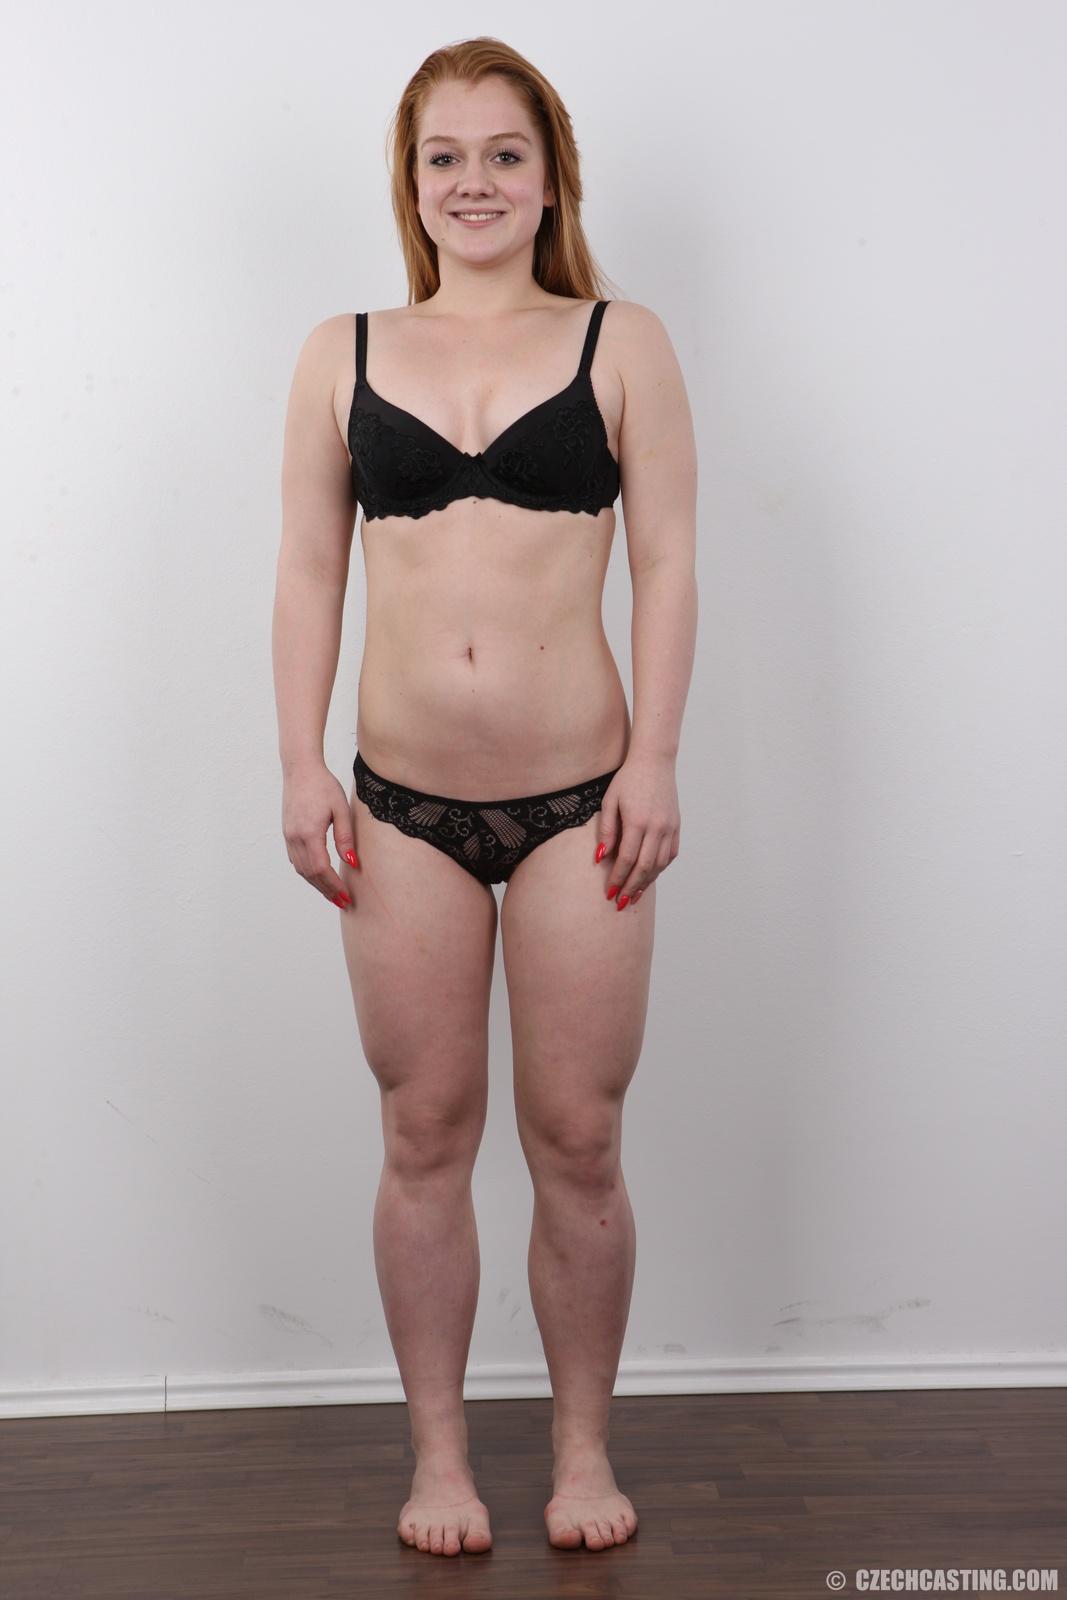 wpid-18-year-old-eliska-casting-photos11.jpg